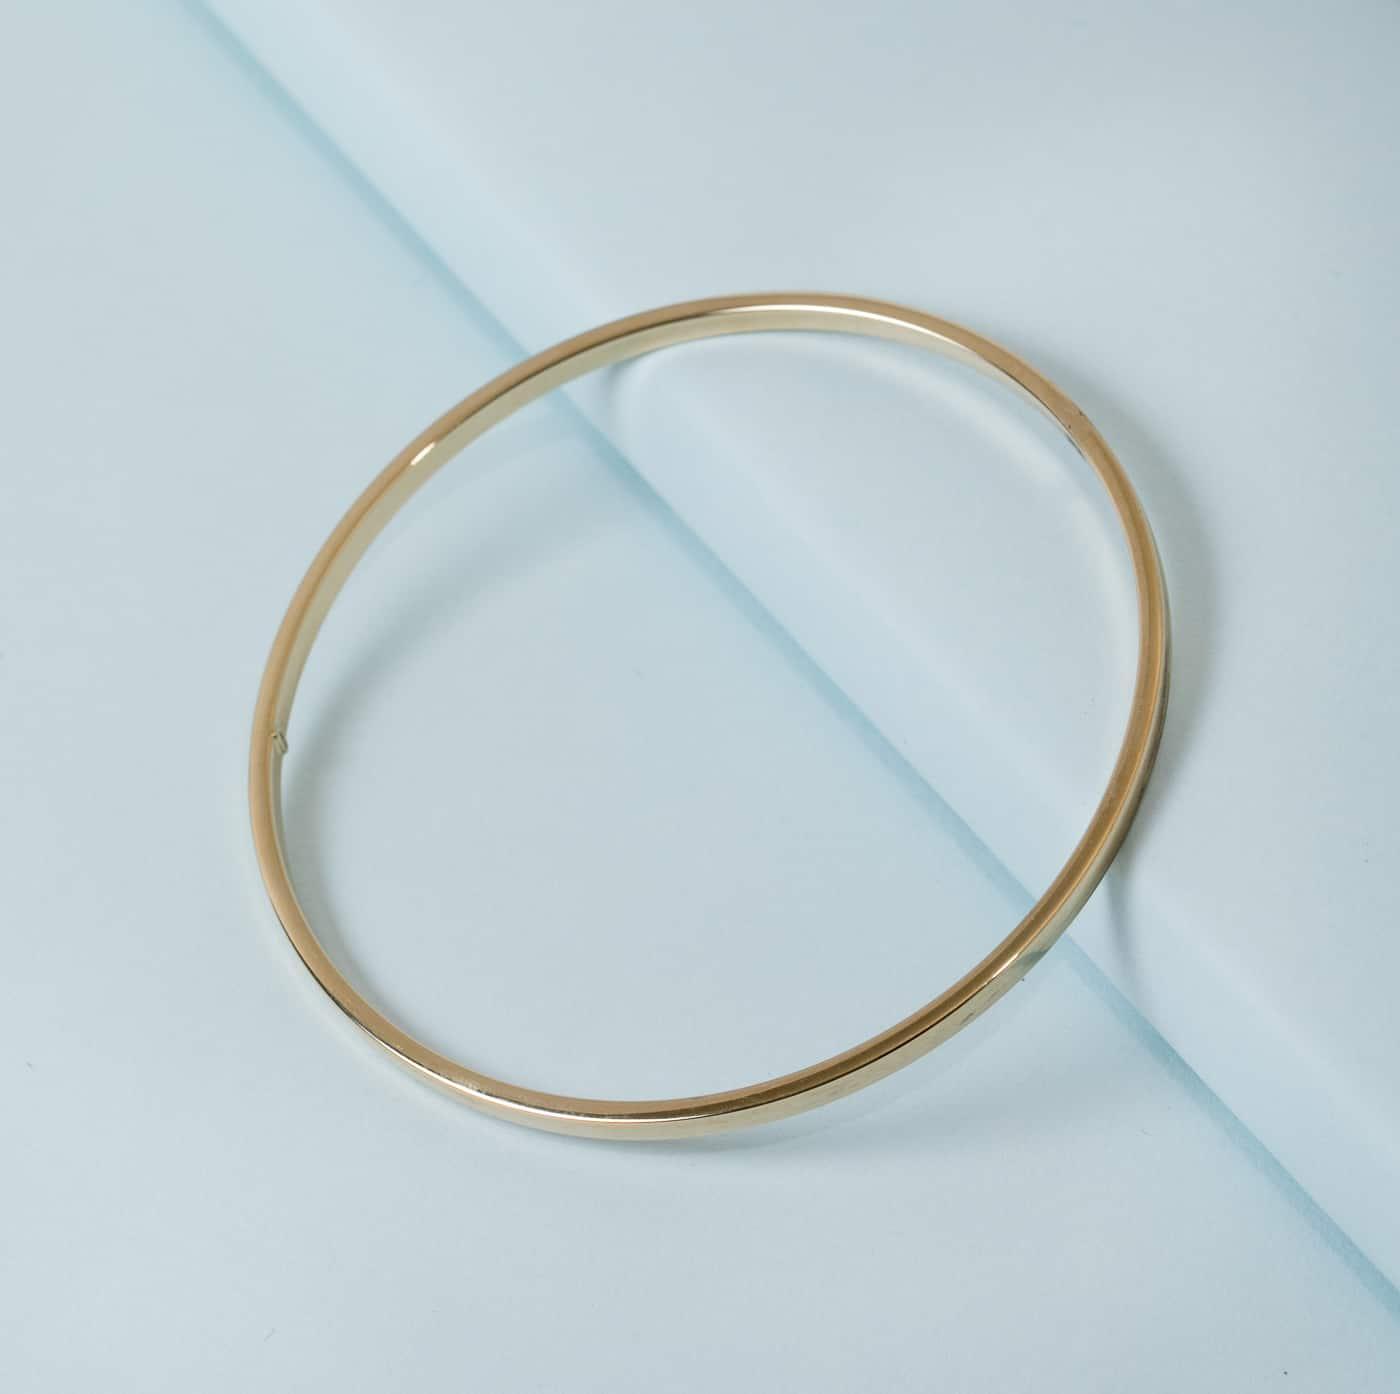 35d9641f9e7 14K Thin Bangle Bracelet Square – KTCollection